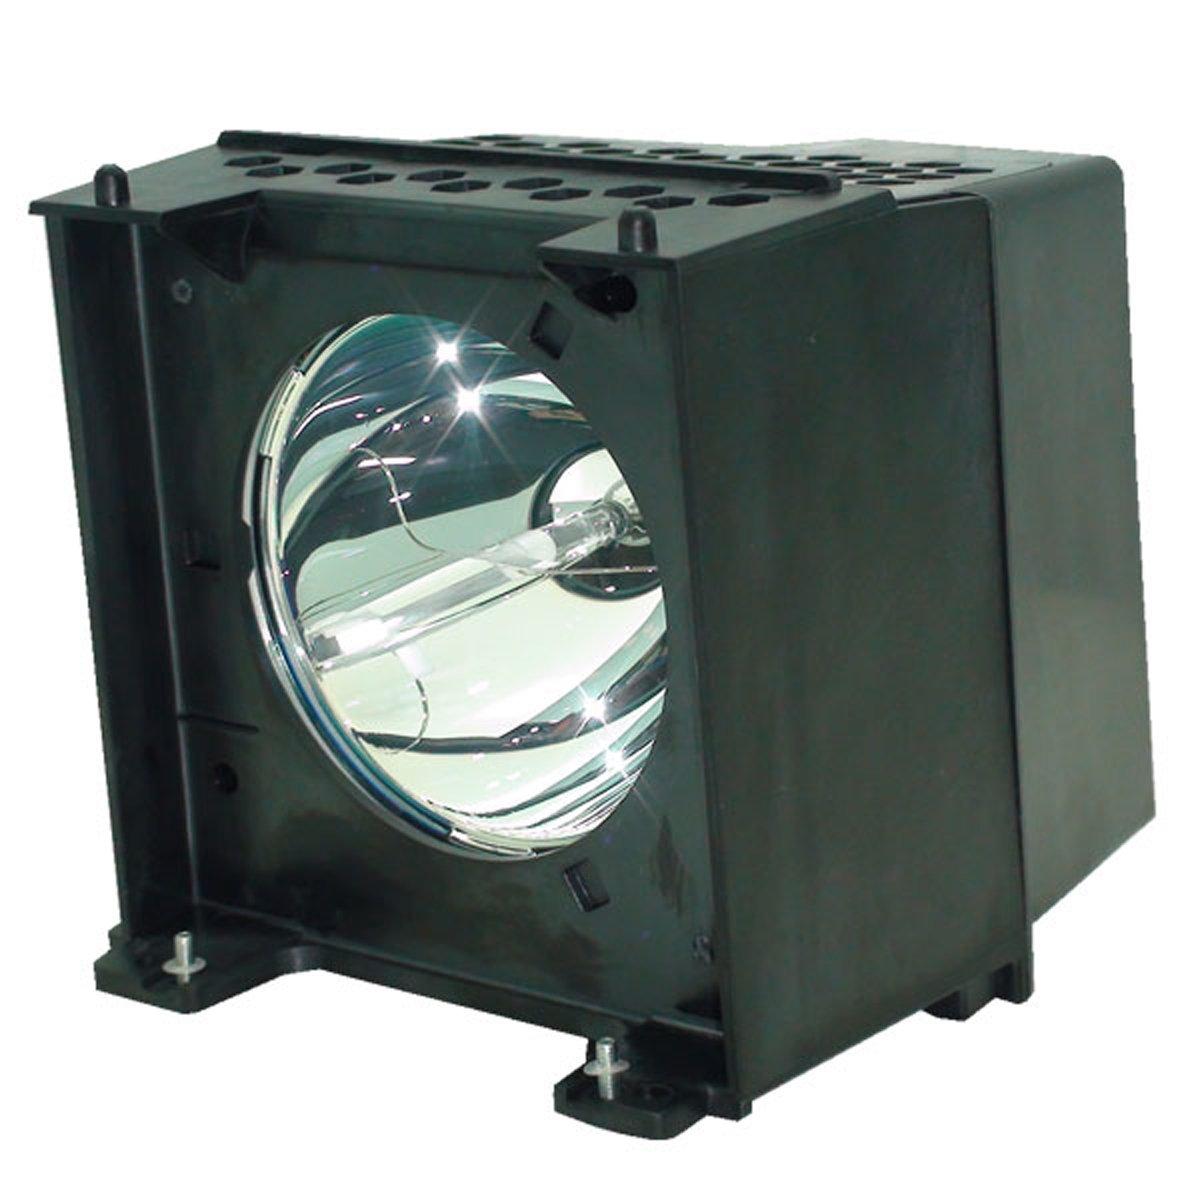 Toshiba y66-lmp DLP / LCDテレビランプwith housing (純正Phoenix Inside )   B01DE9GLOW